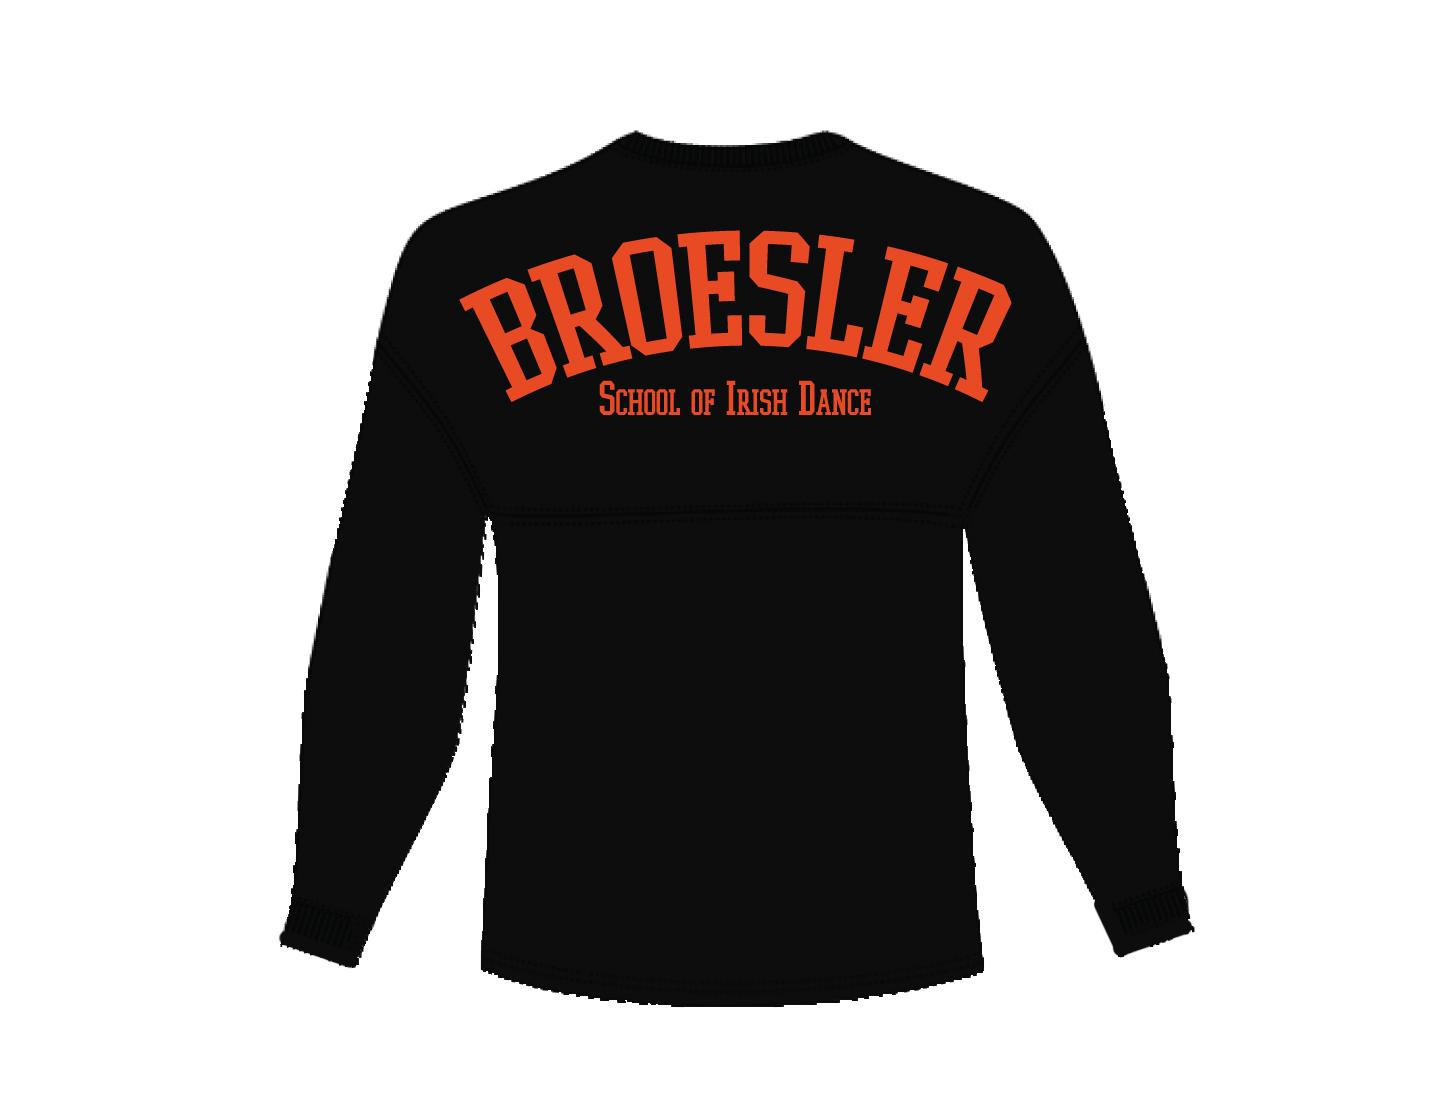 broesler_thumb.jpg